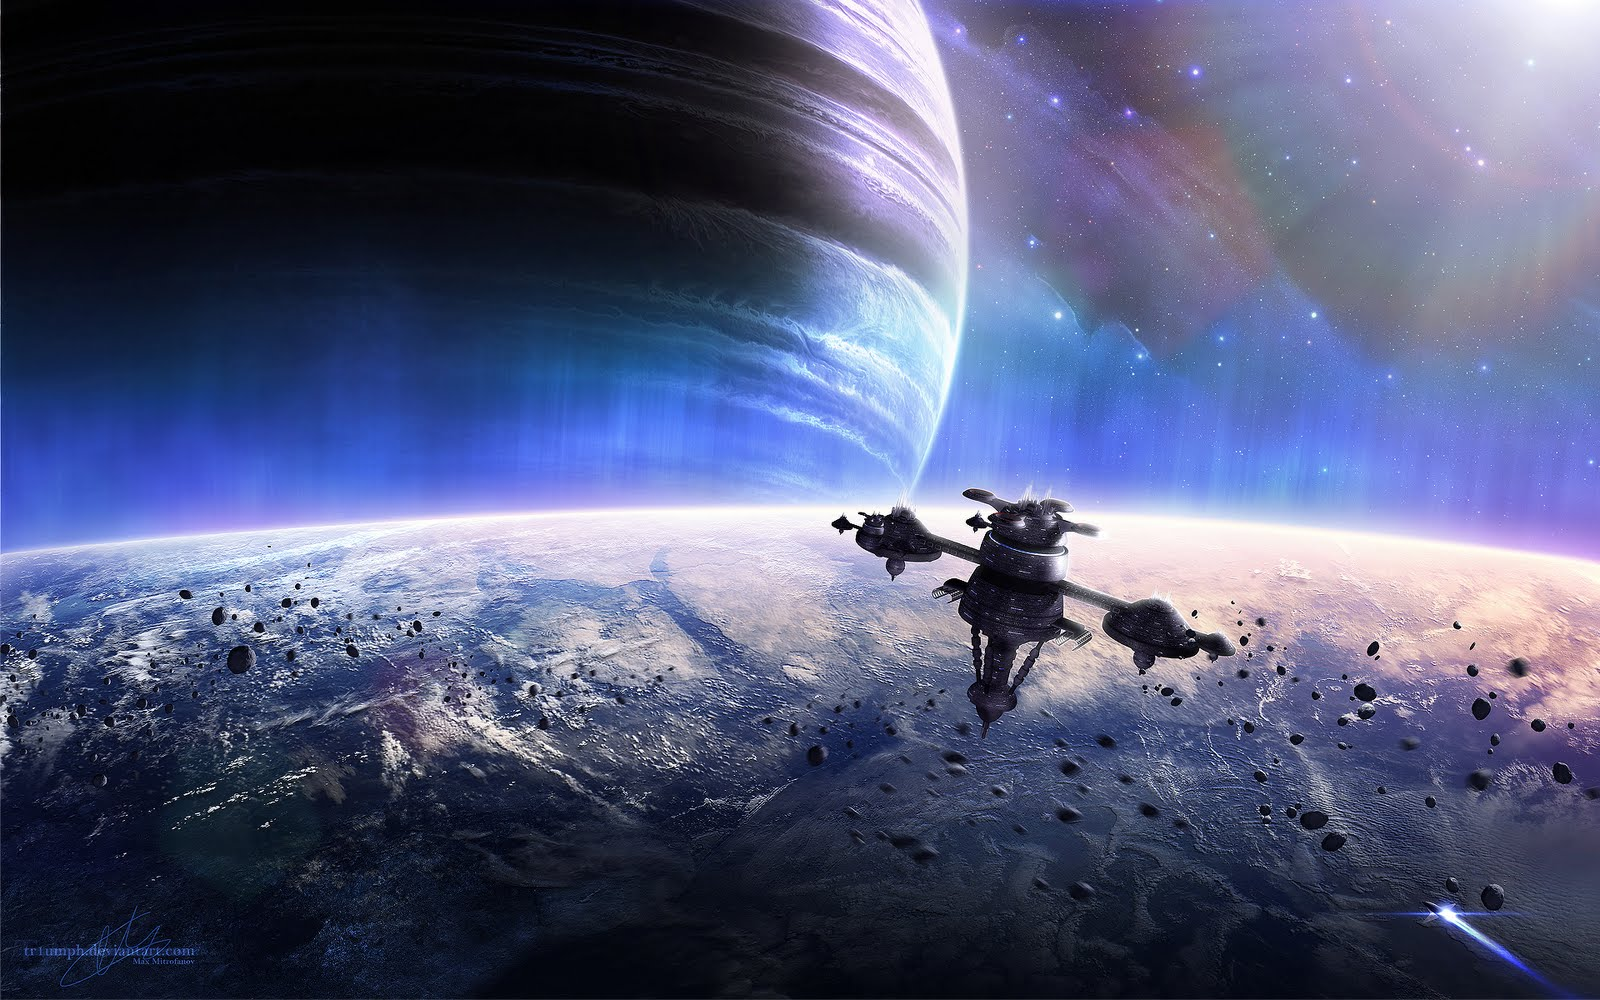 Blogger For Wallpaper: space station wallpaper